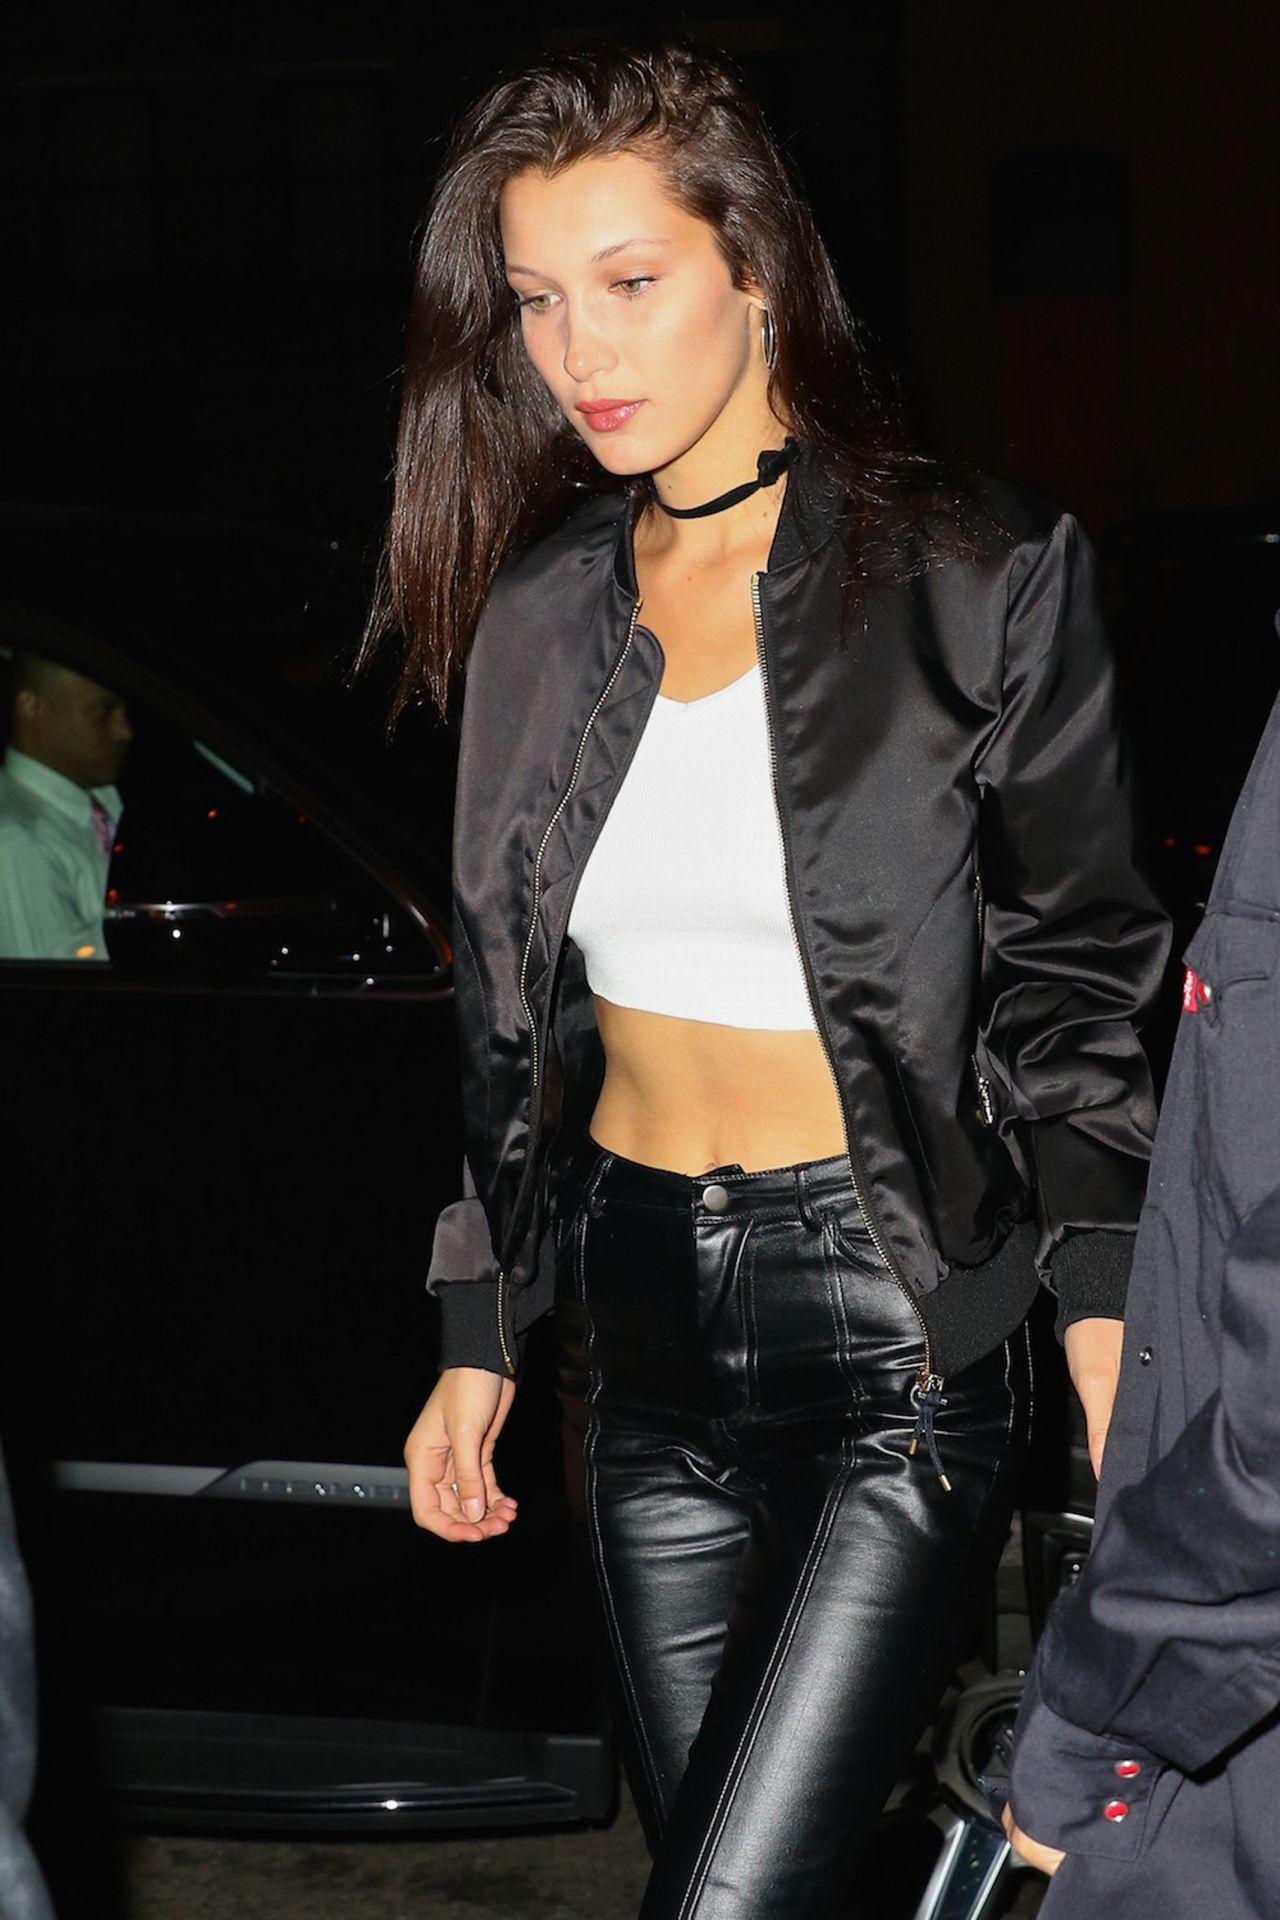 Bella Hadid At Ralph Lauren Runway Show At New York: Bella Hadid Night Out Style